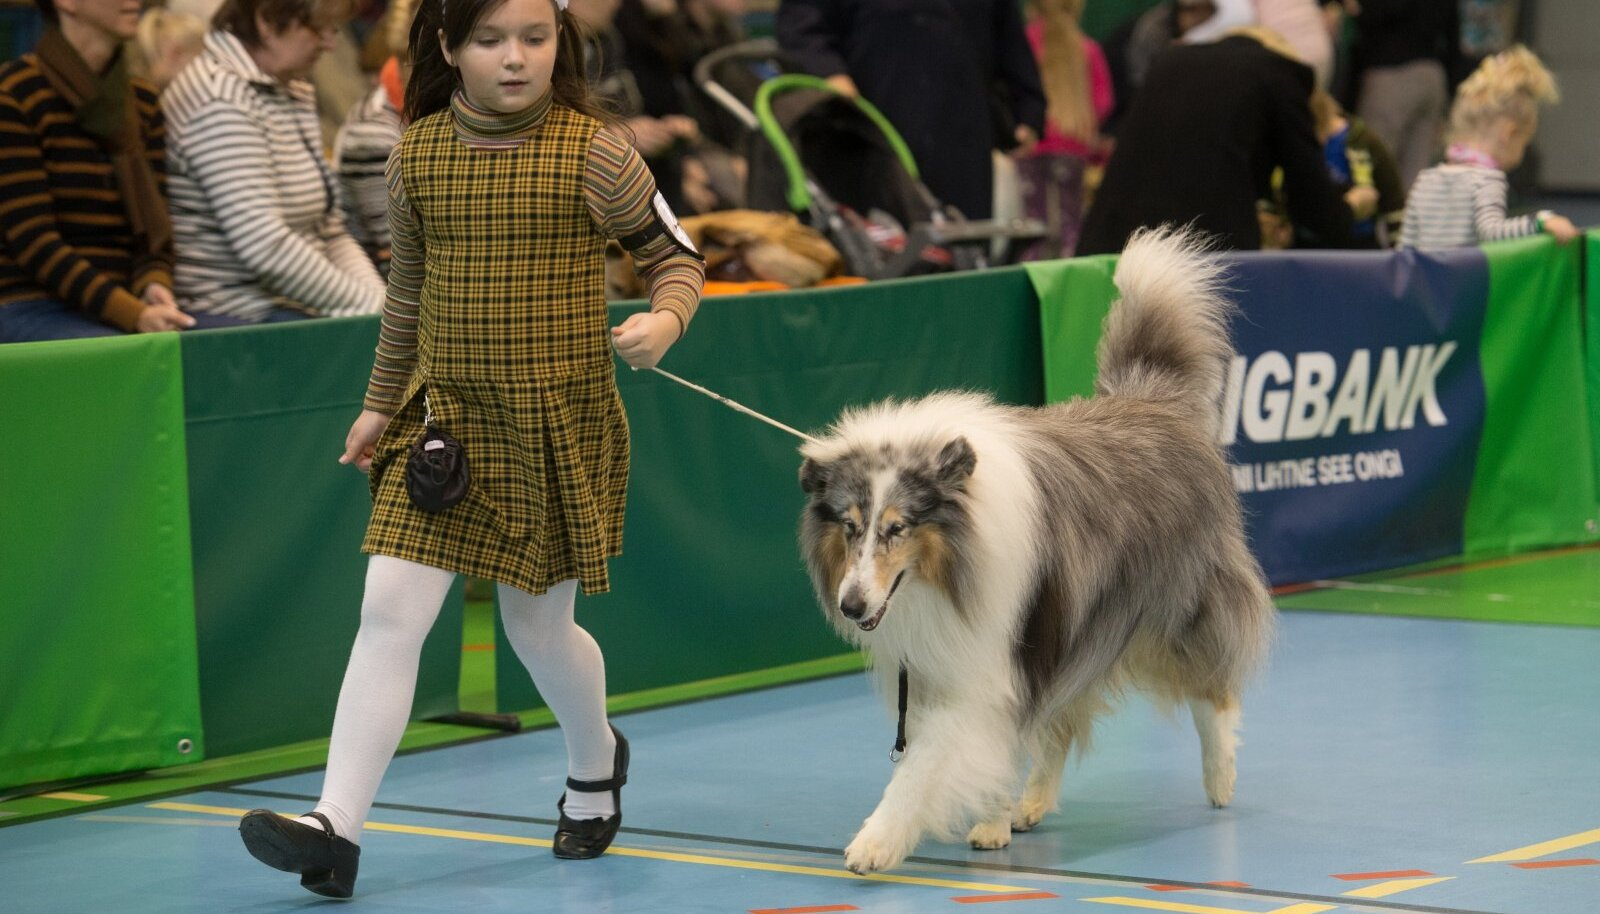 Heategevuslik koertenäitus BIGBANK Match Show